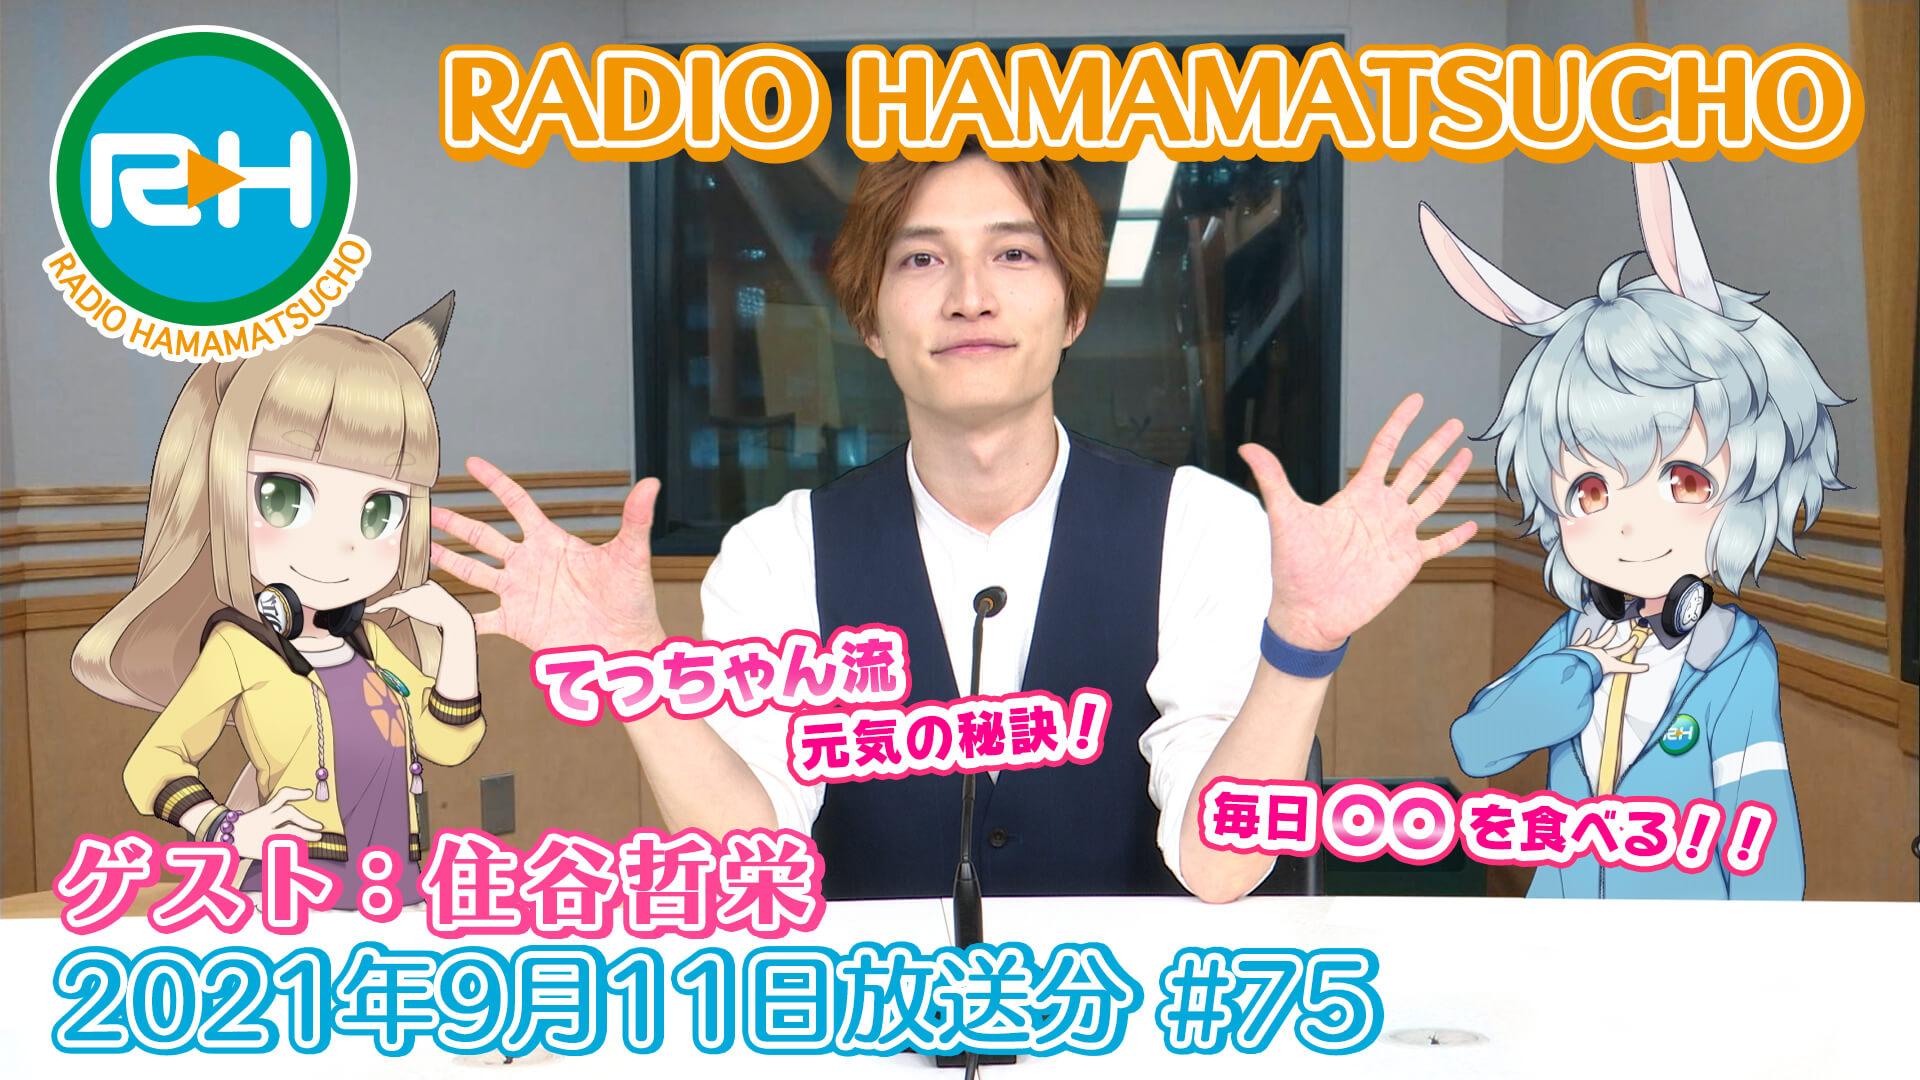 RADIO HAMAMATSUCHO 第75回 (2021年9月11日放送分) ゲスト: 住谷哲栄